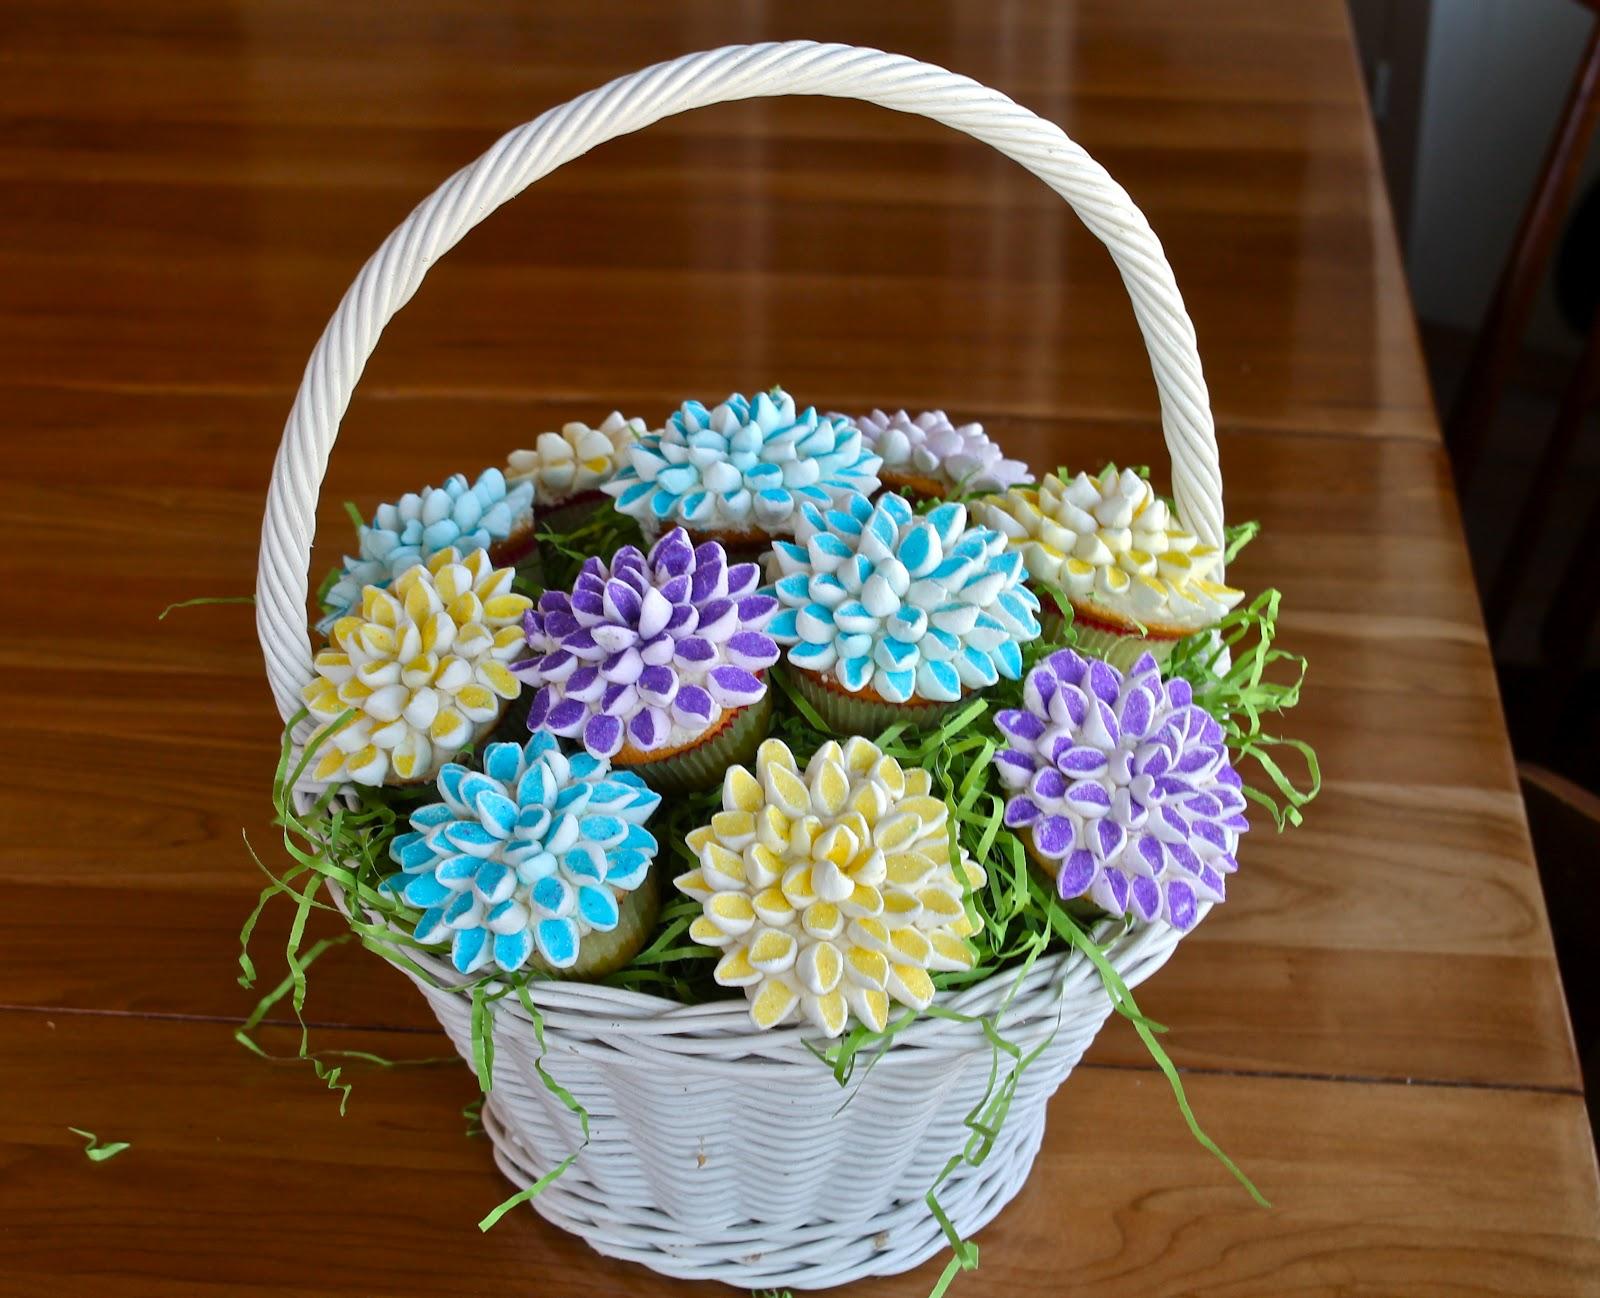 Yammies noshery marshmallow flower cupcakes marshmallow flower cupcakes izmirmasajfo